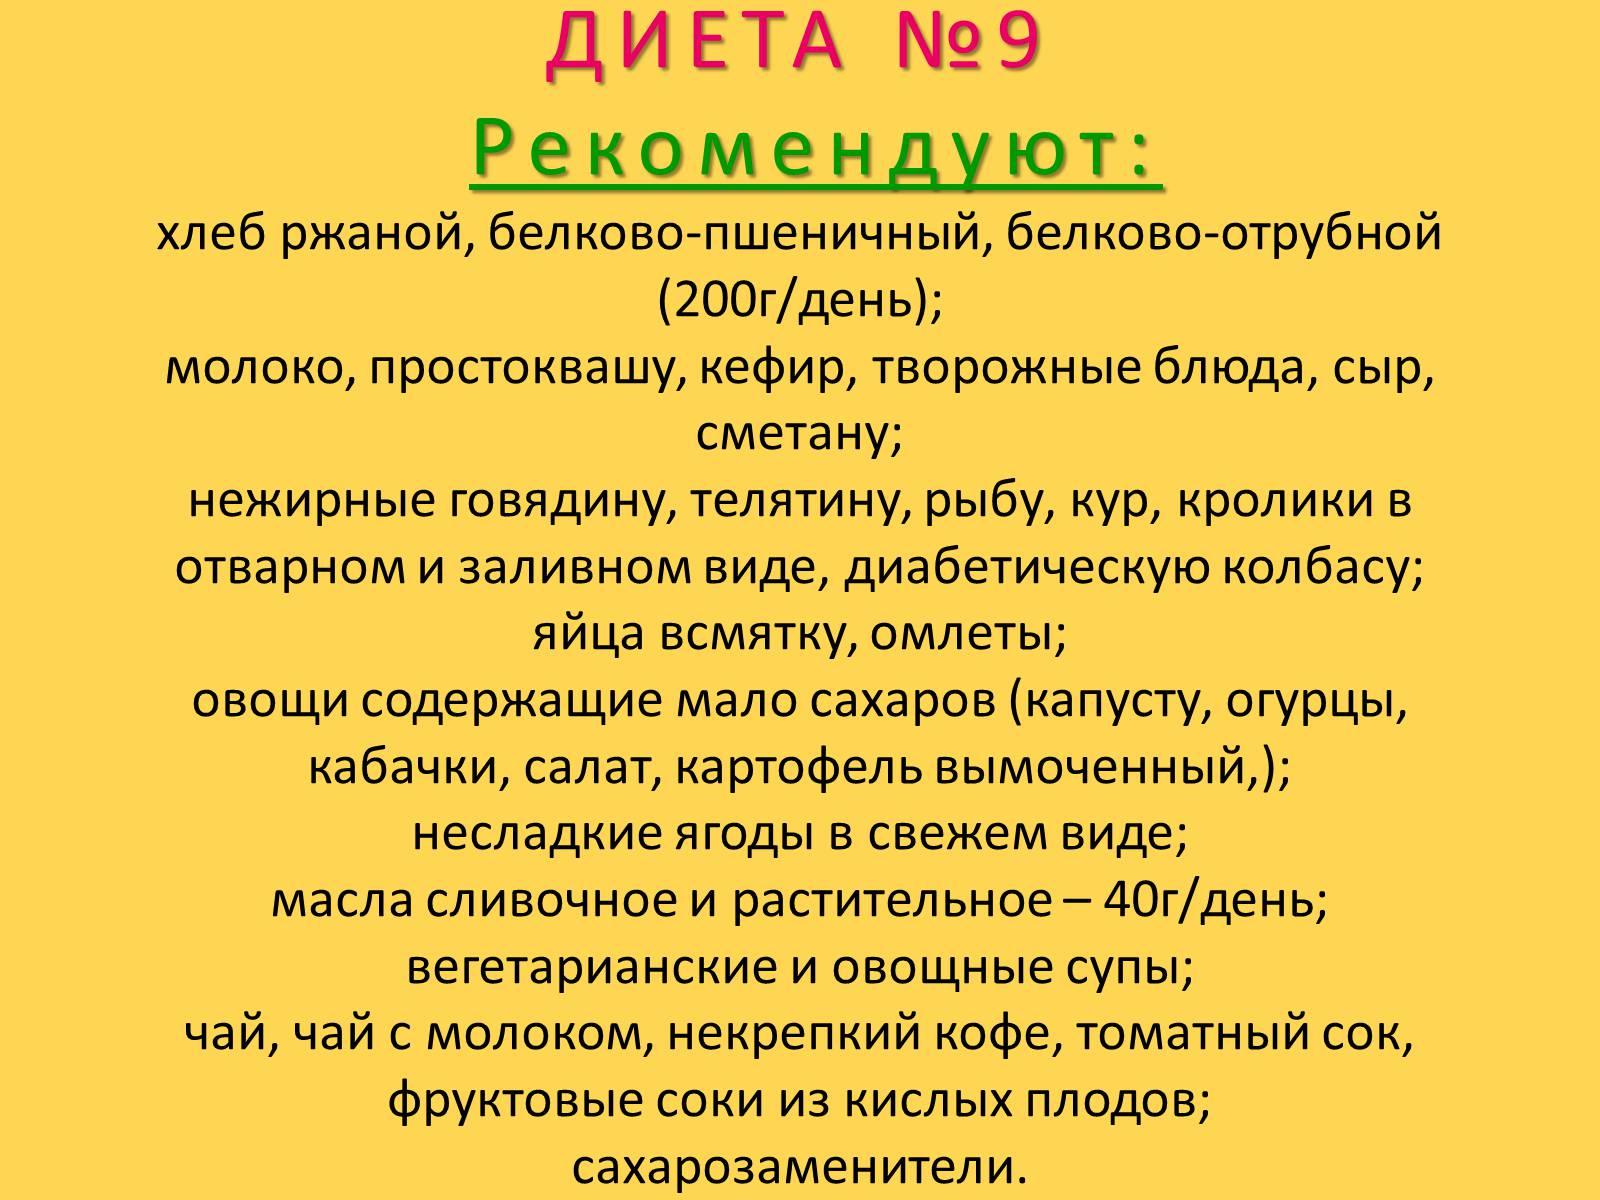 Диета Сахарного Диабета Меню.